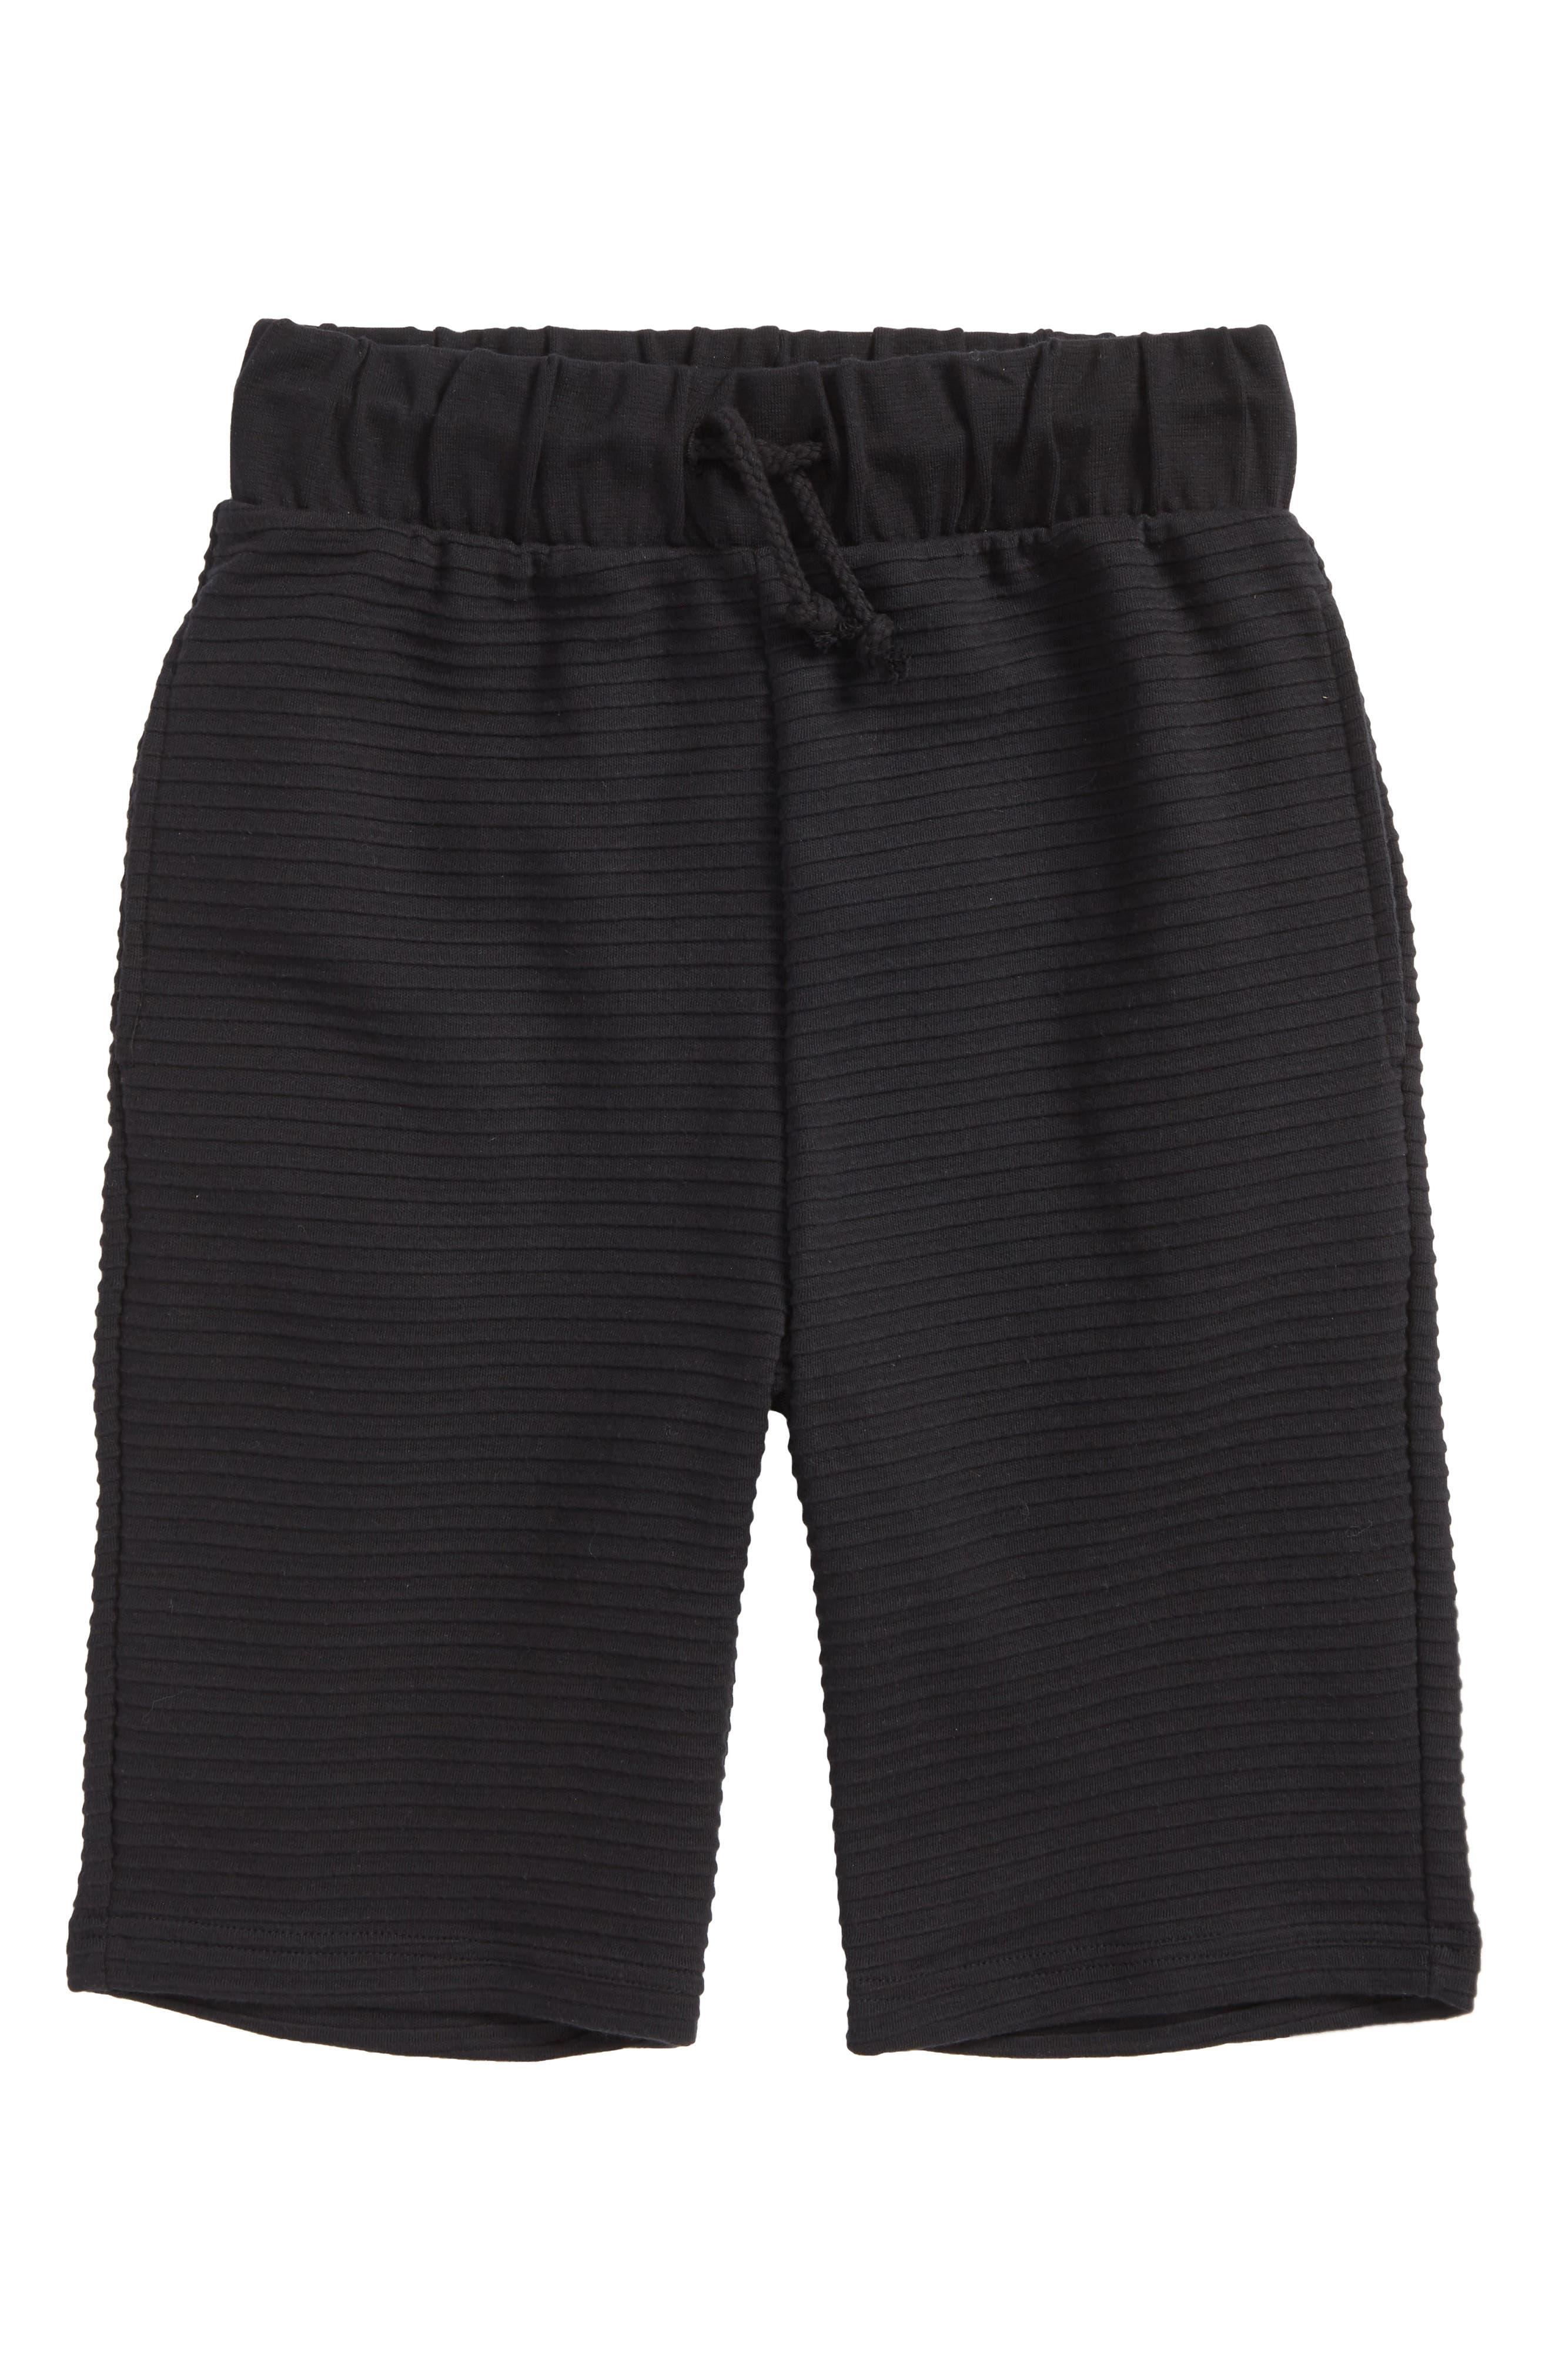 Freddie Knit Shorts,                             Main thumbnail 1, color,                             Black